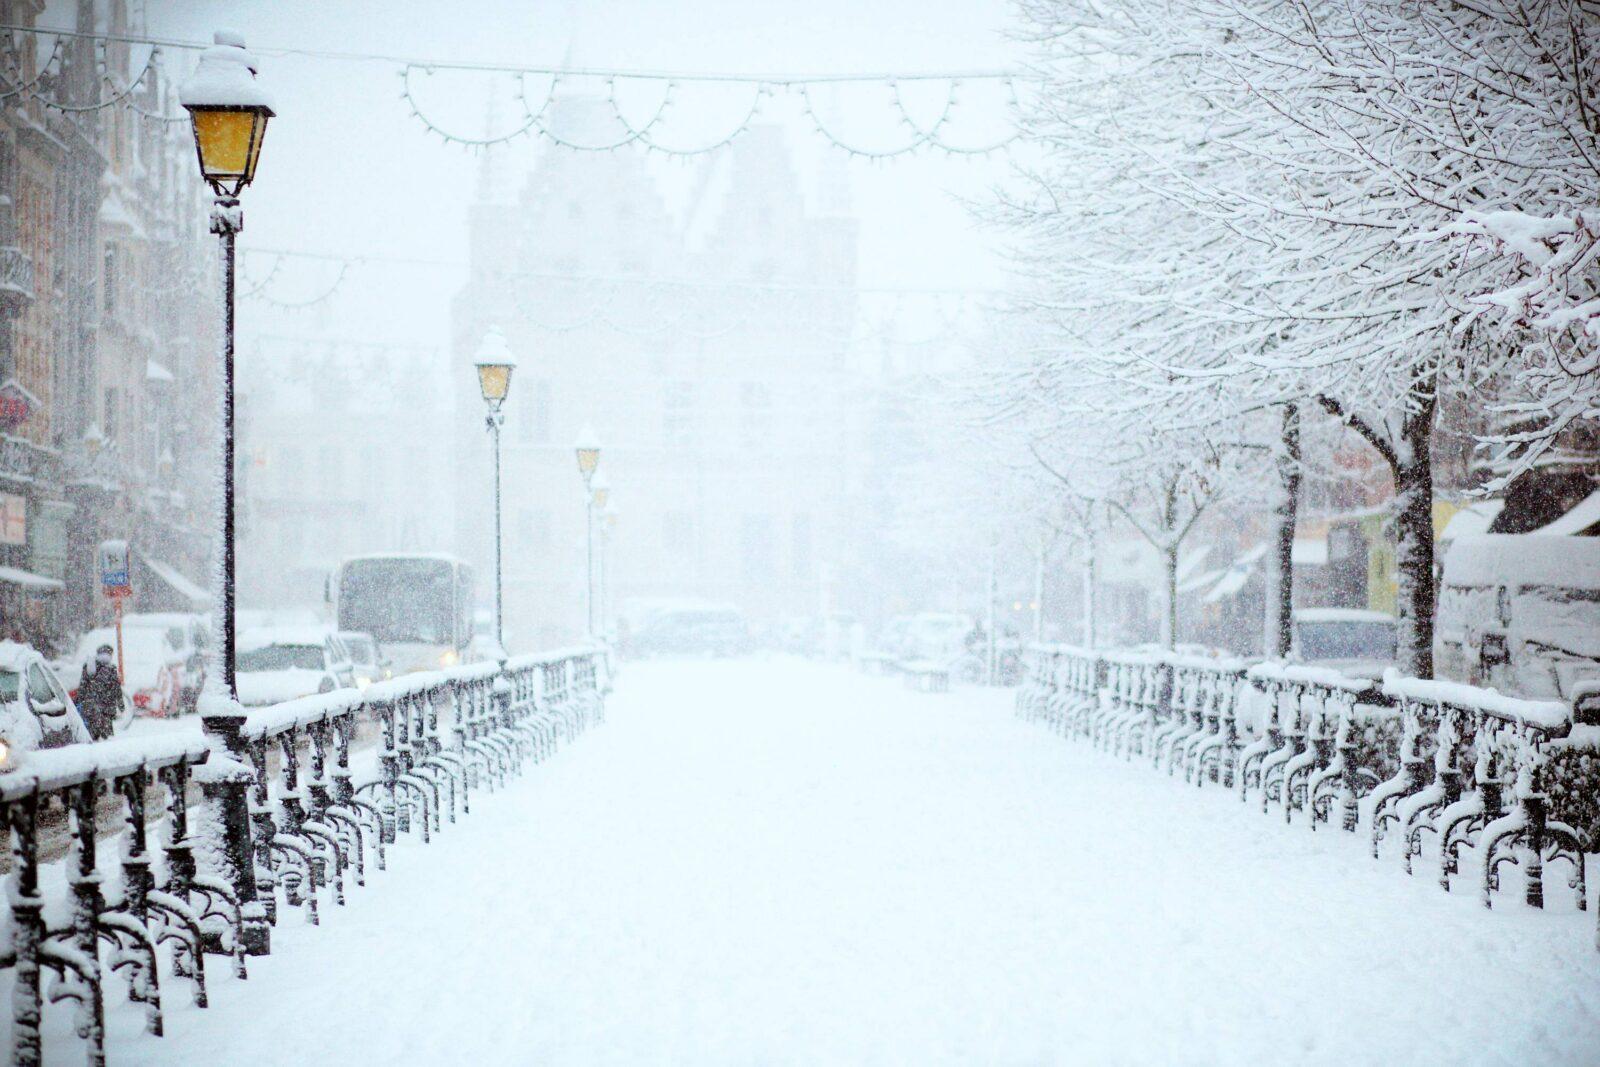 Snowy Christmas street